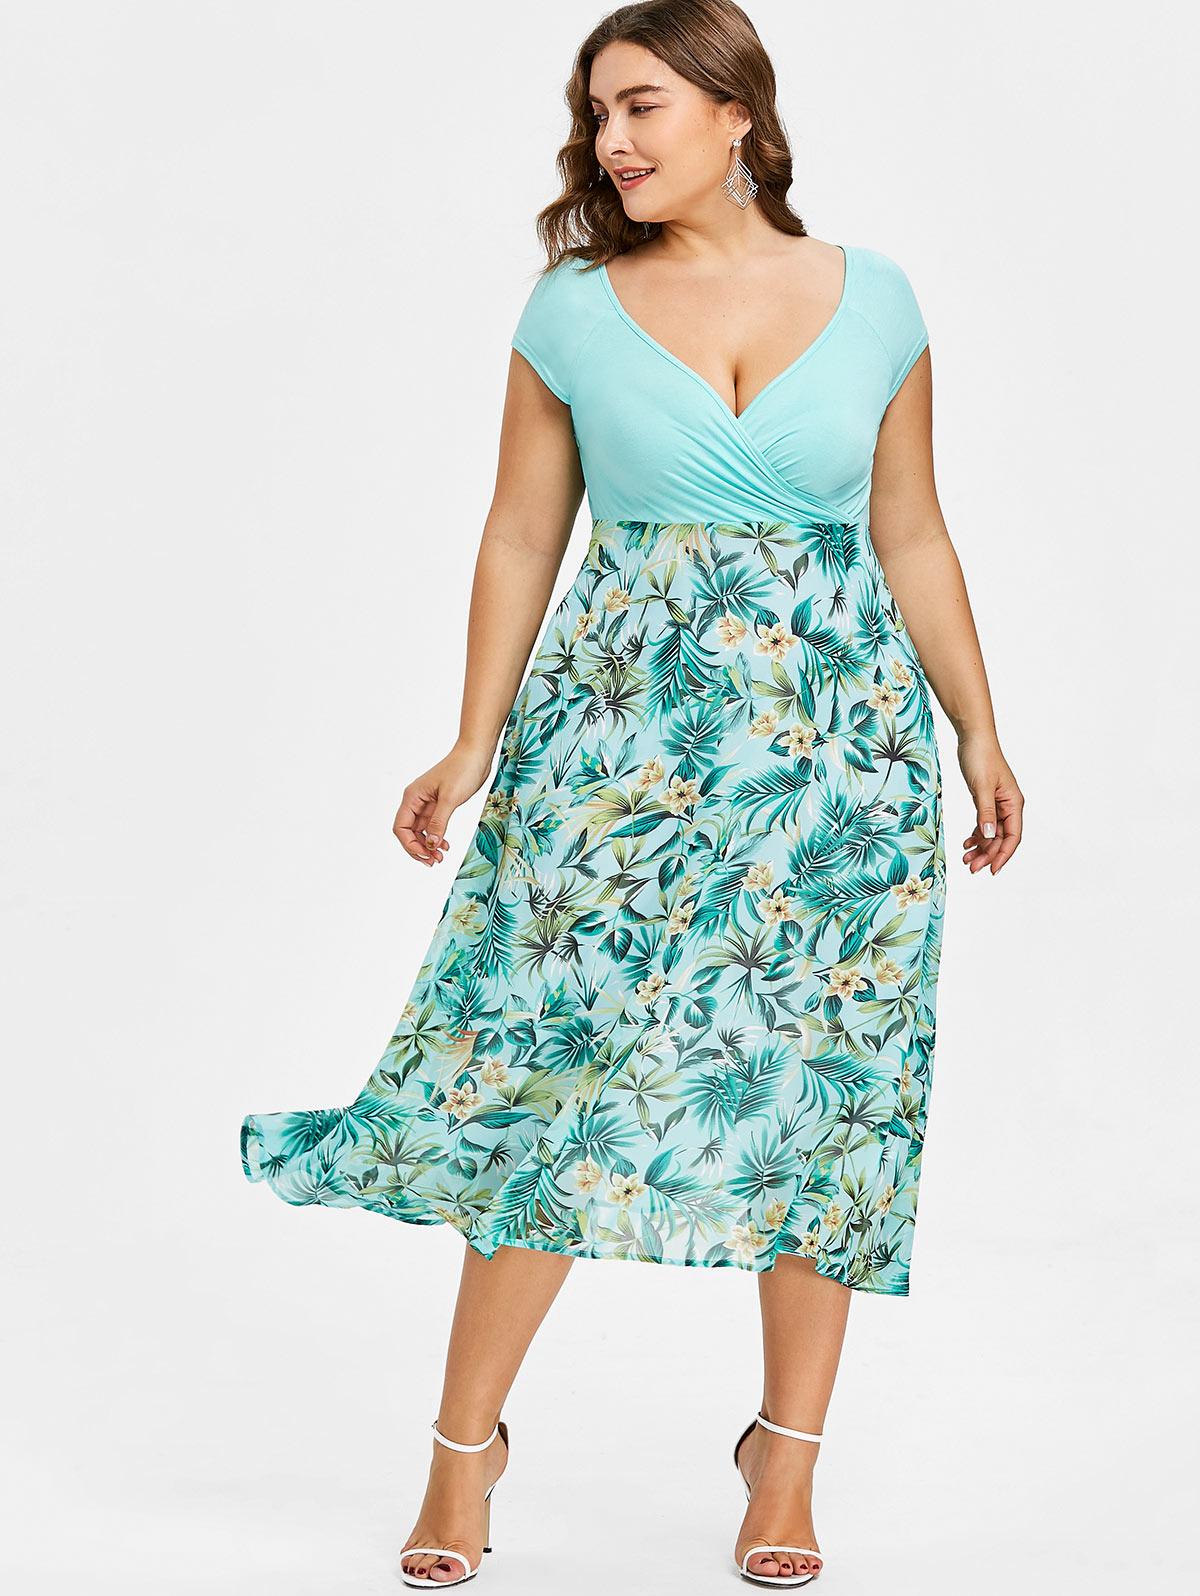 Gamiss Women Plus Size 5xl Tropical Floral Print V Neck A